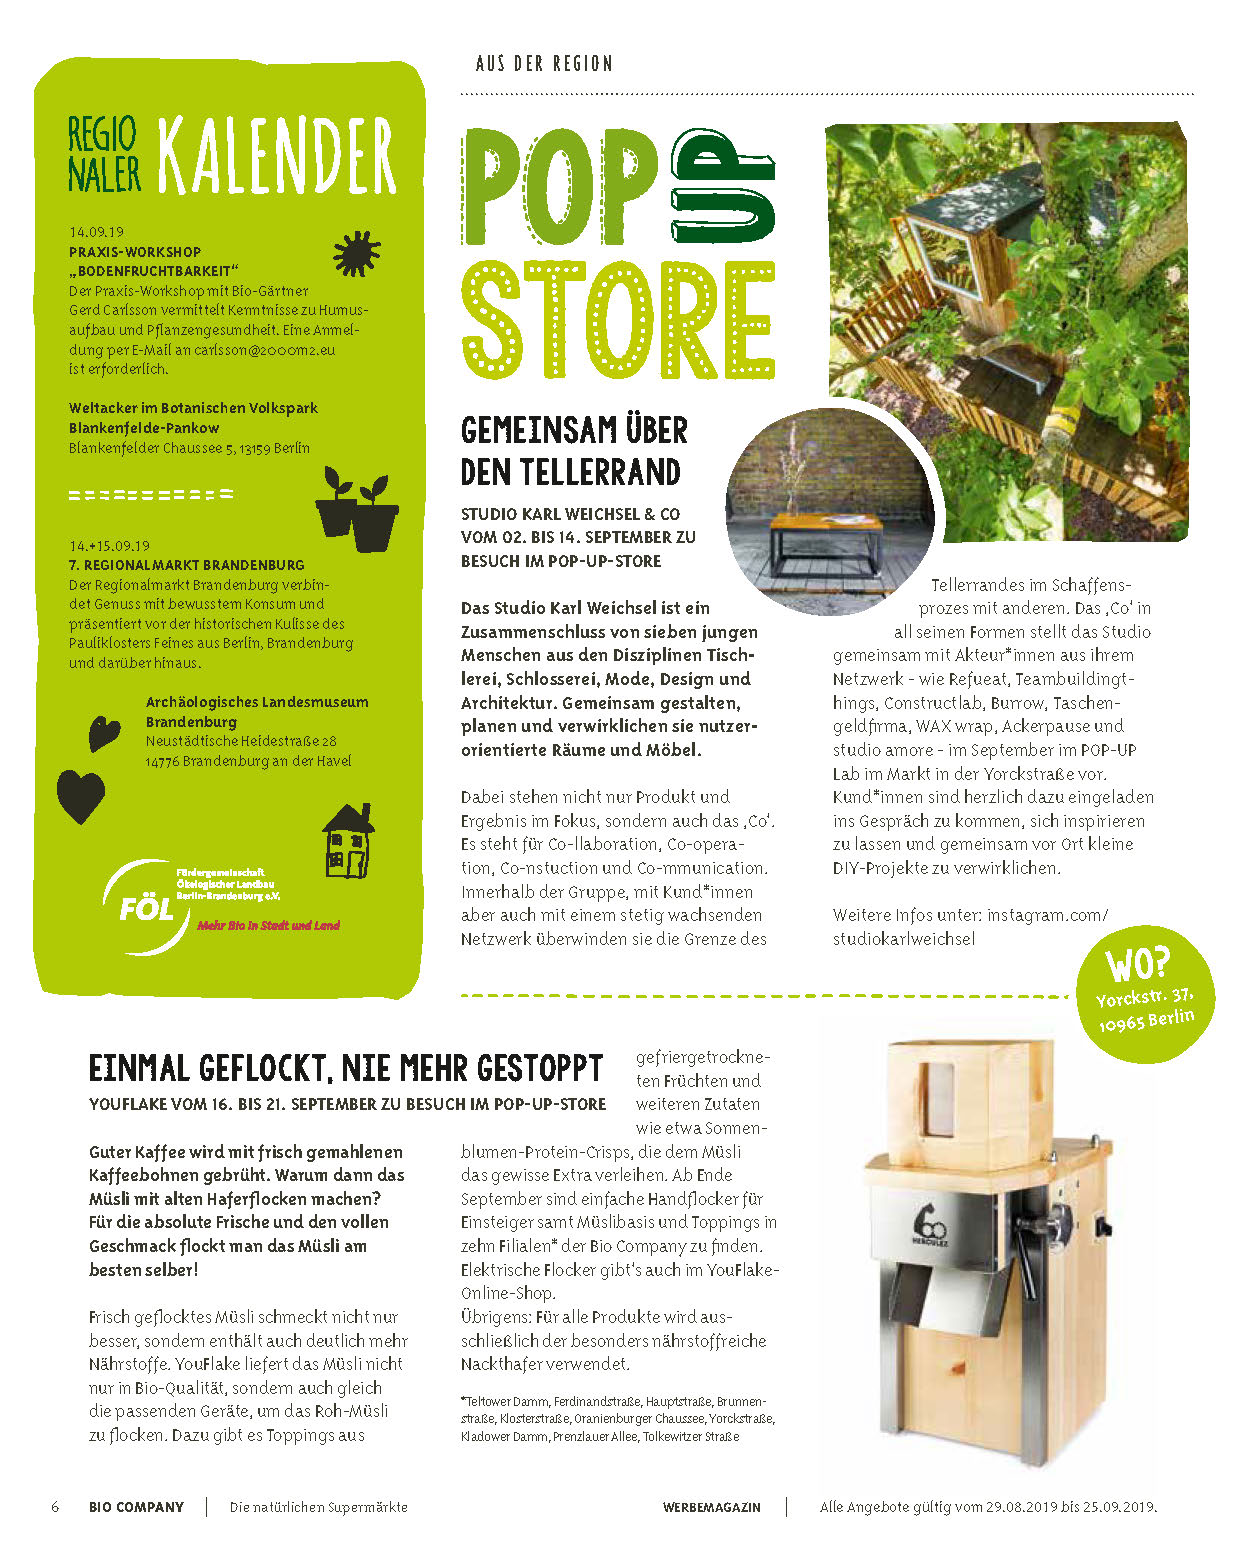 YouFlake im Bio Company Kundenmagazin